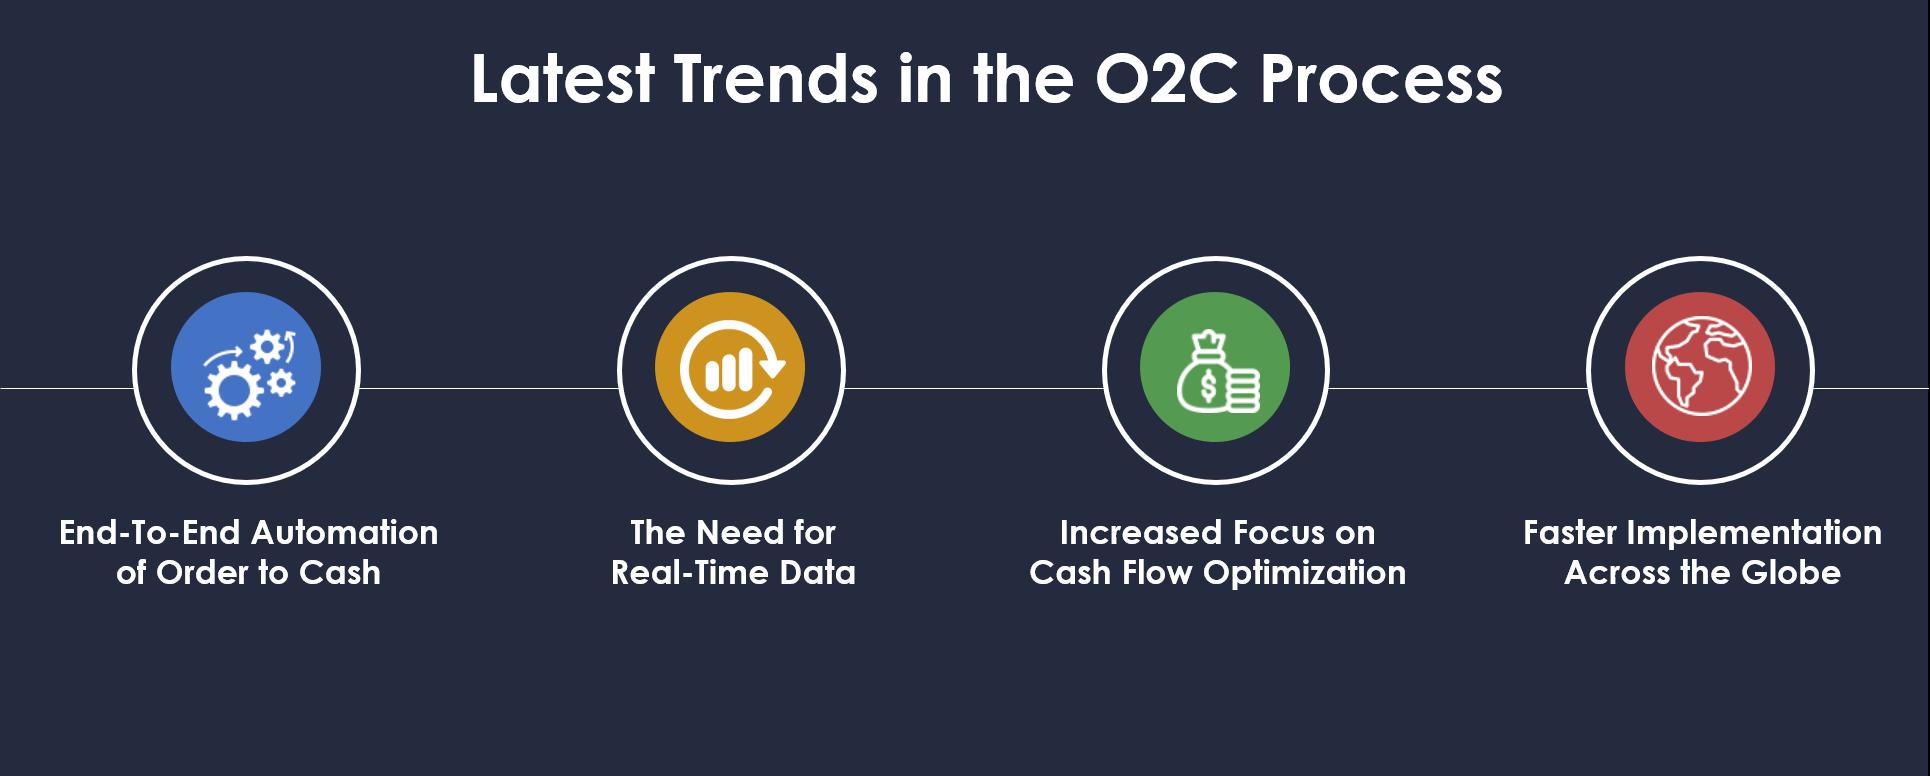 O2C Process Trends